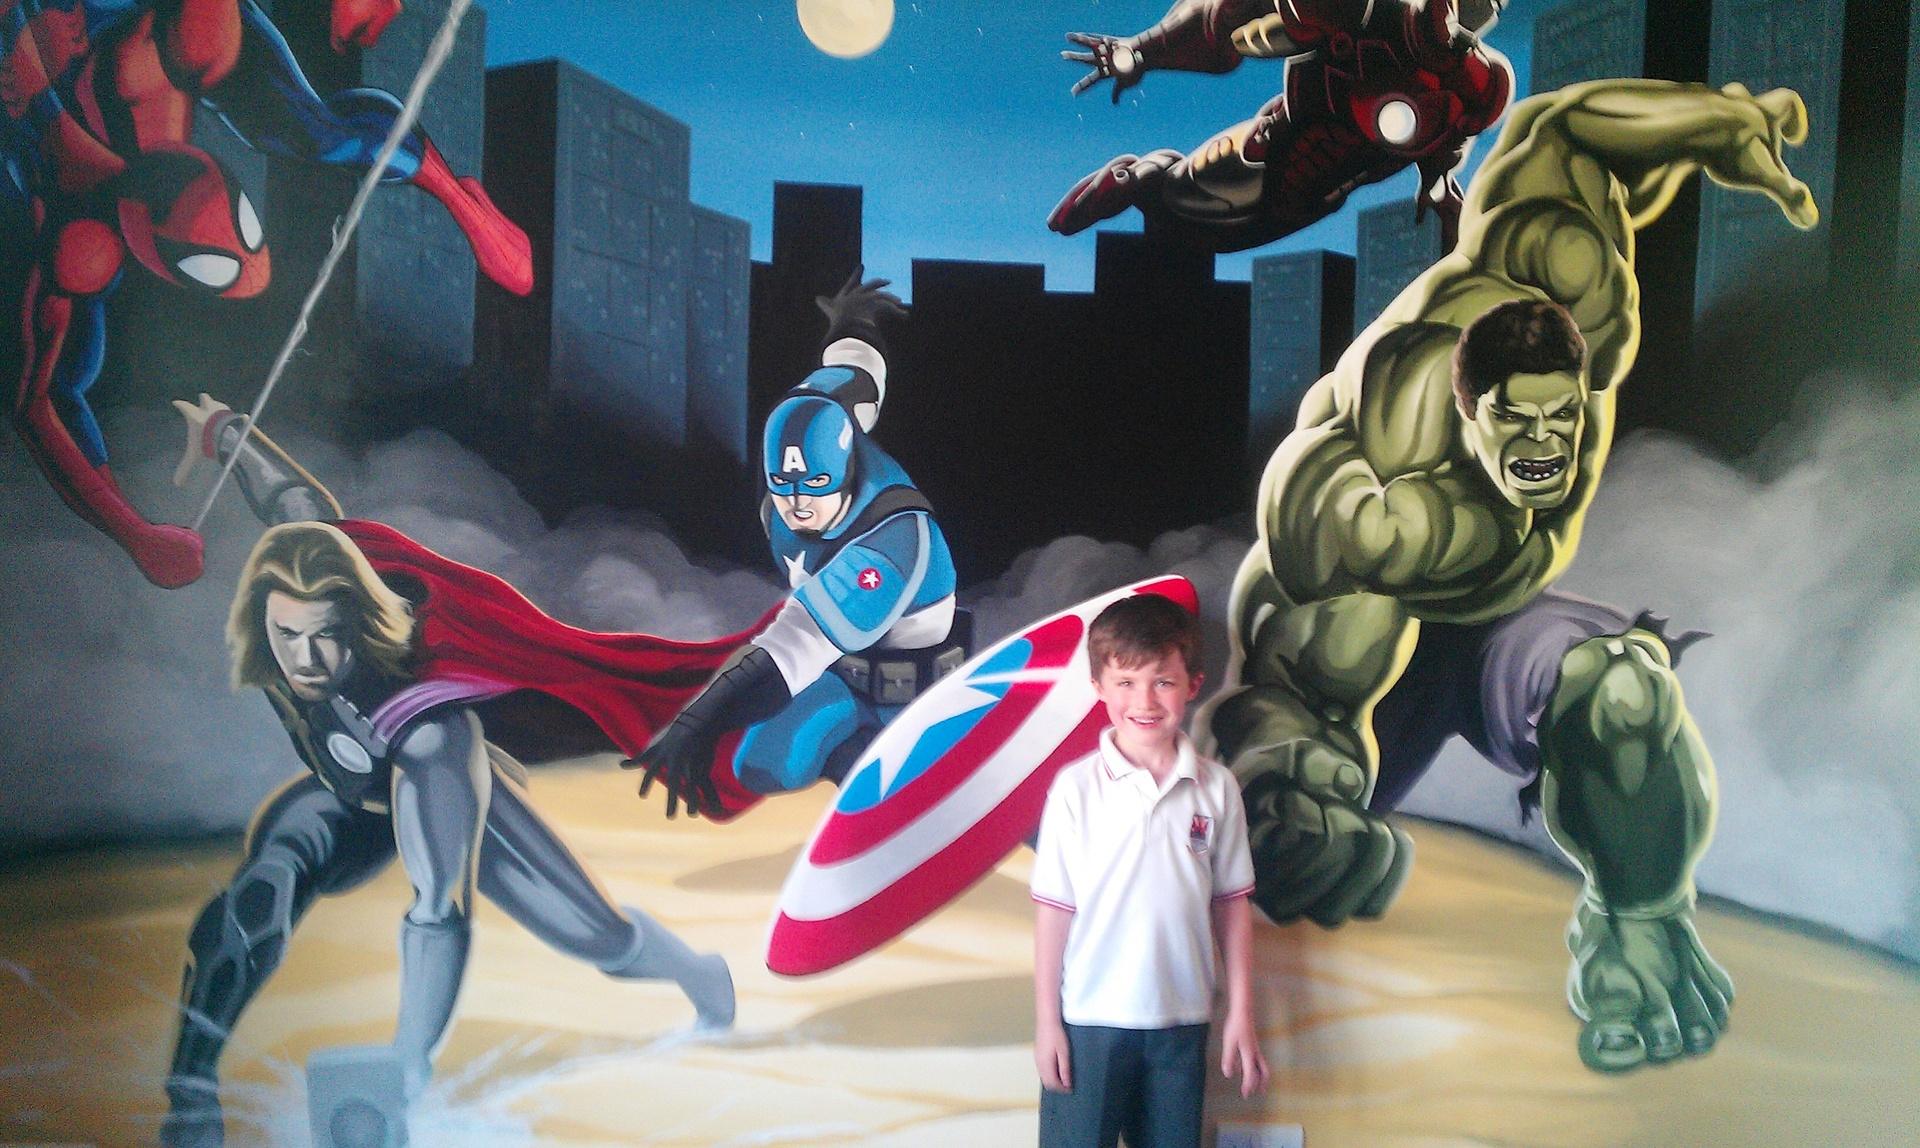 superhero wall mural www galleryhip com the hippest pics marvel super hero bedroom wall marvel super hero bedroom